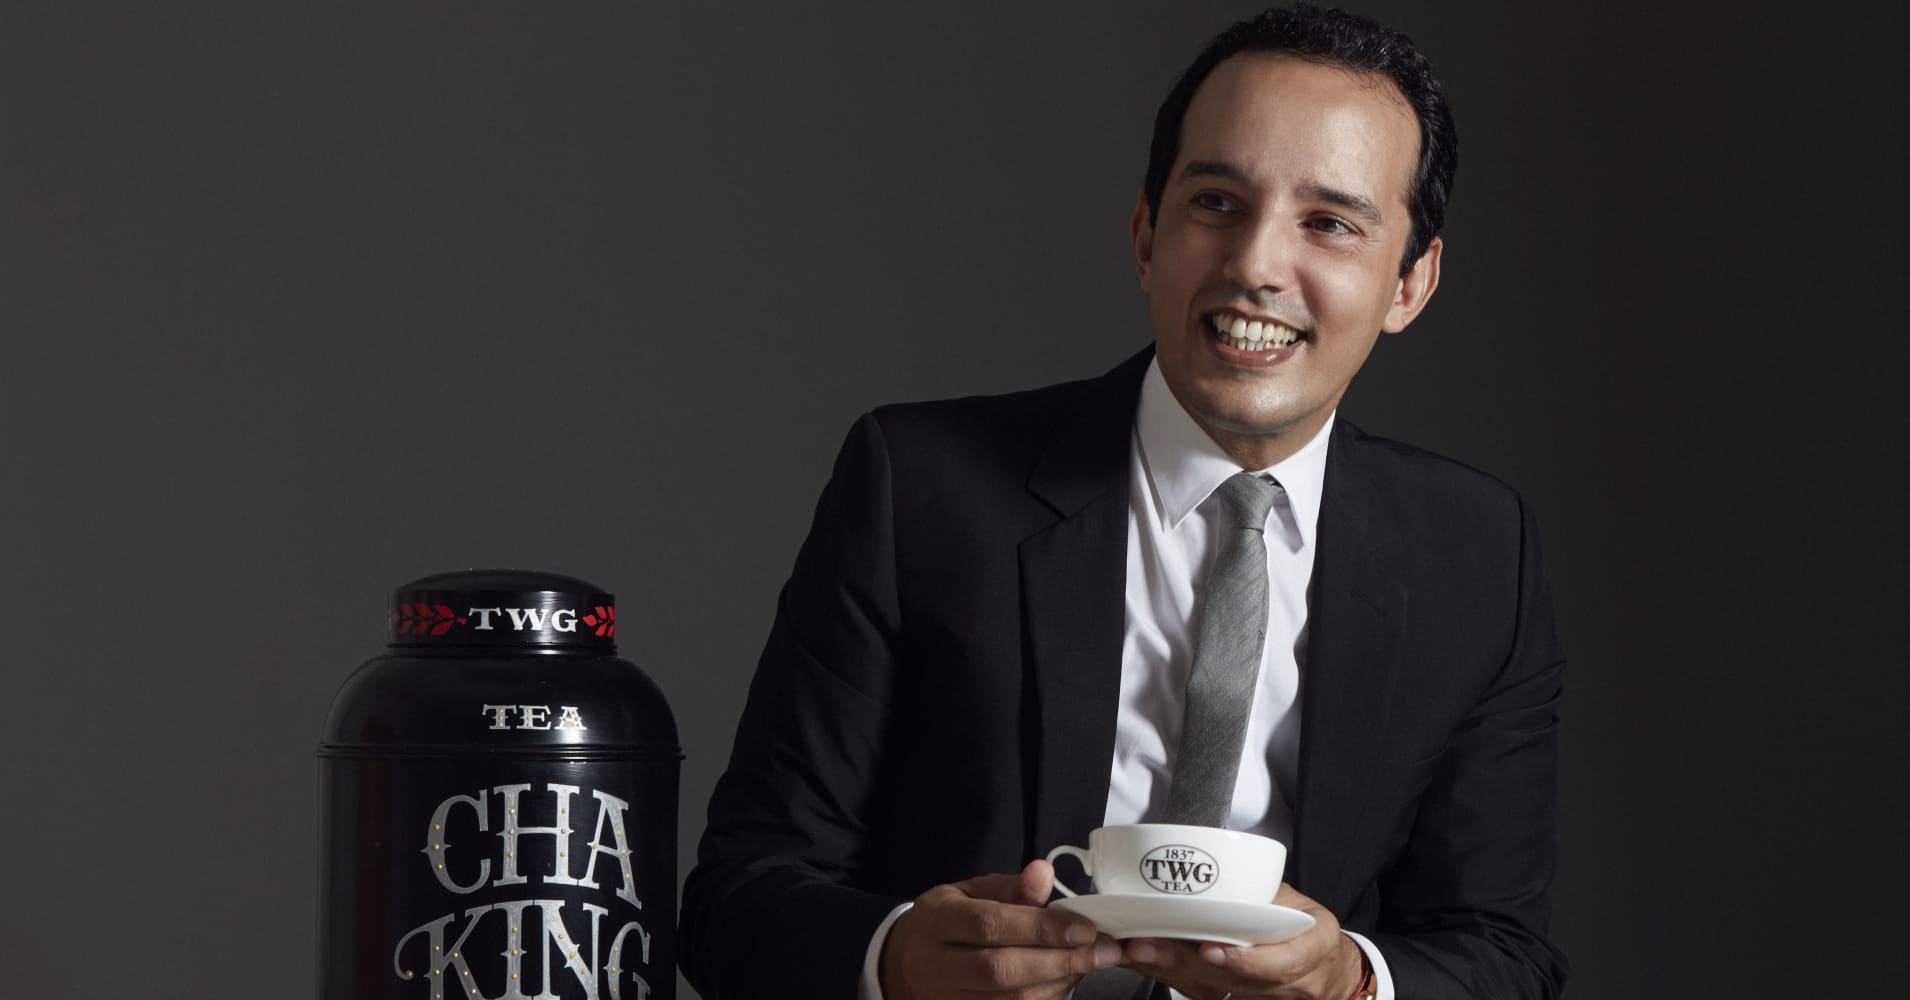 Taha Bouqdib, co-founder, CEO and president of TWG Tea.